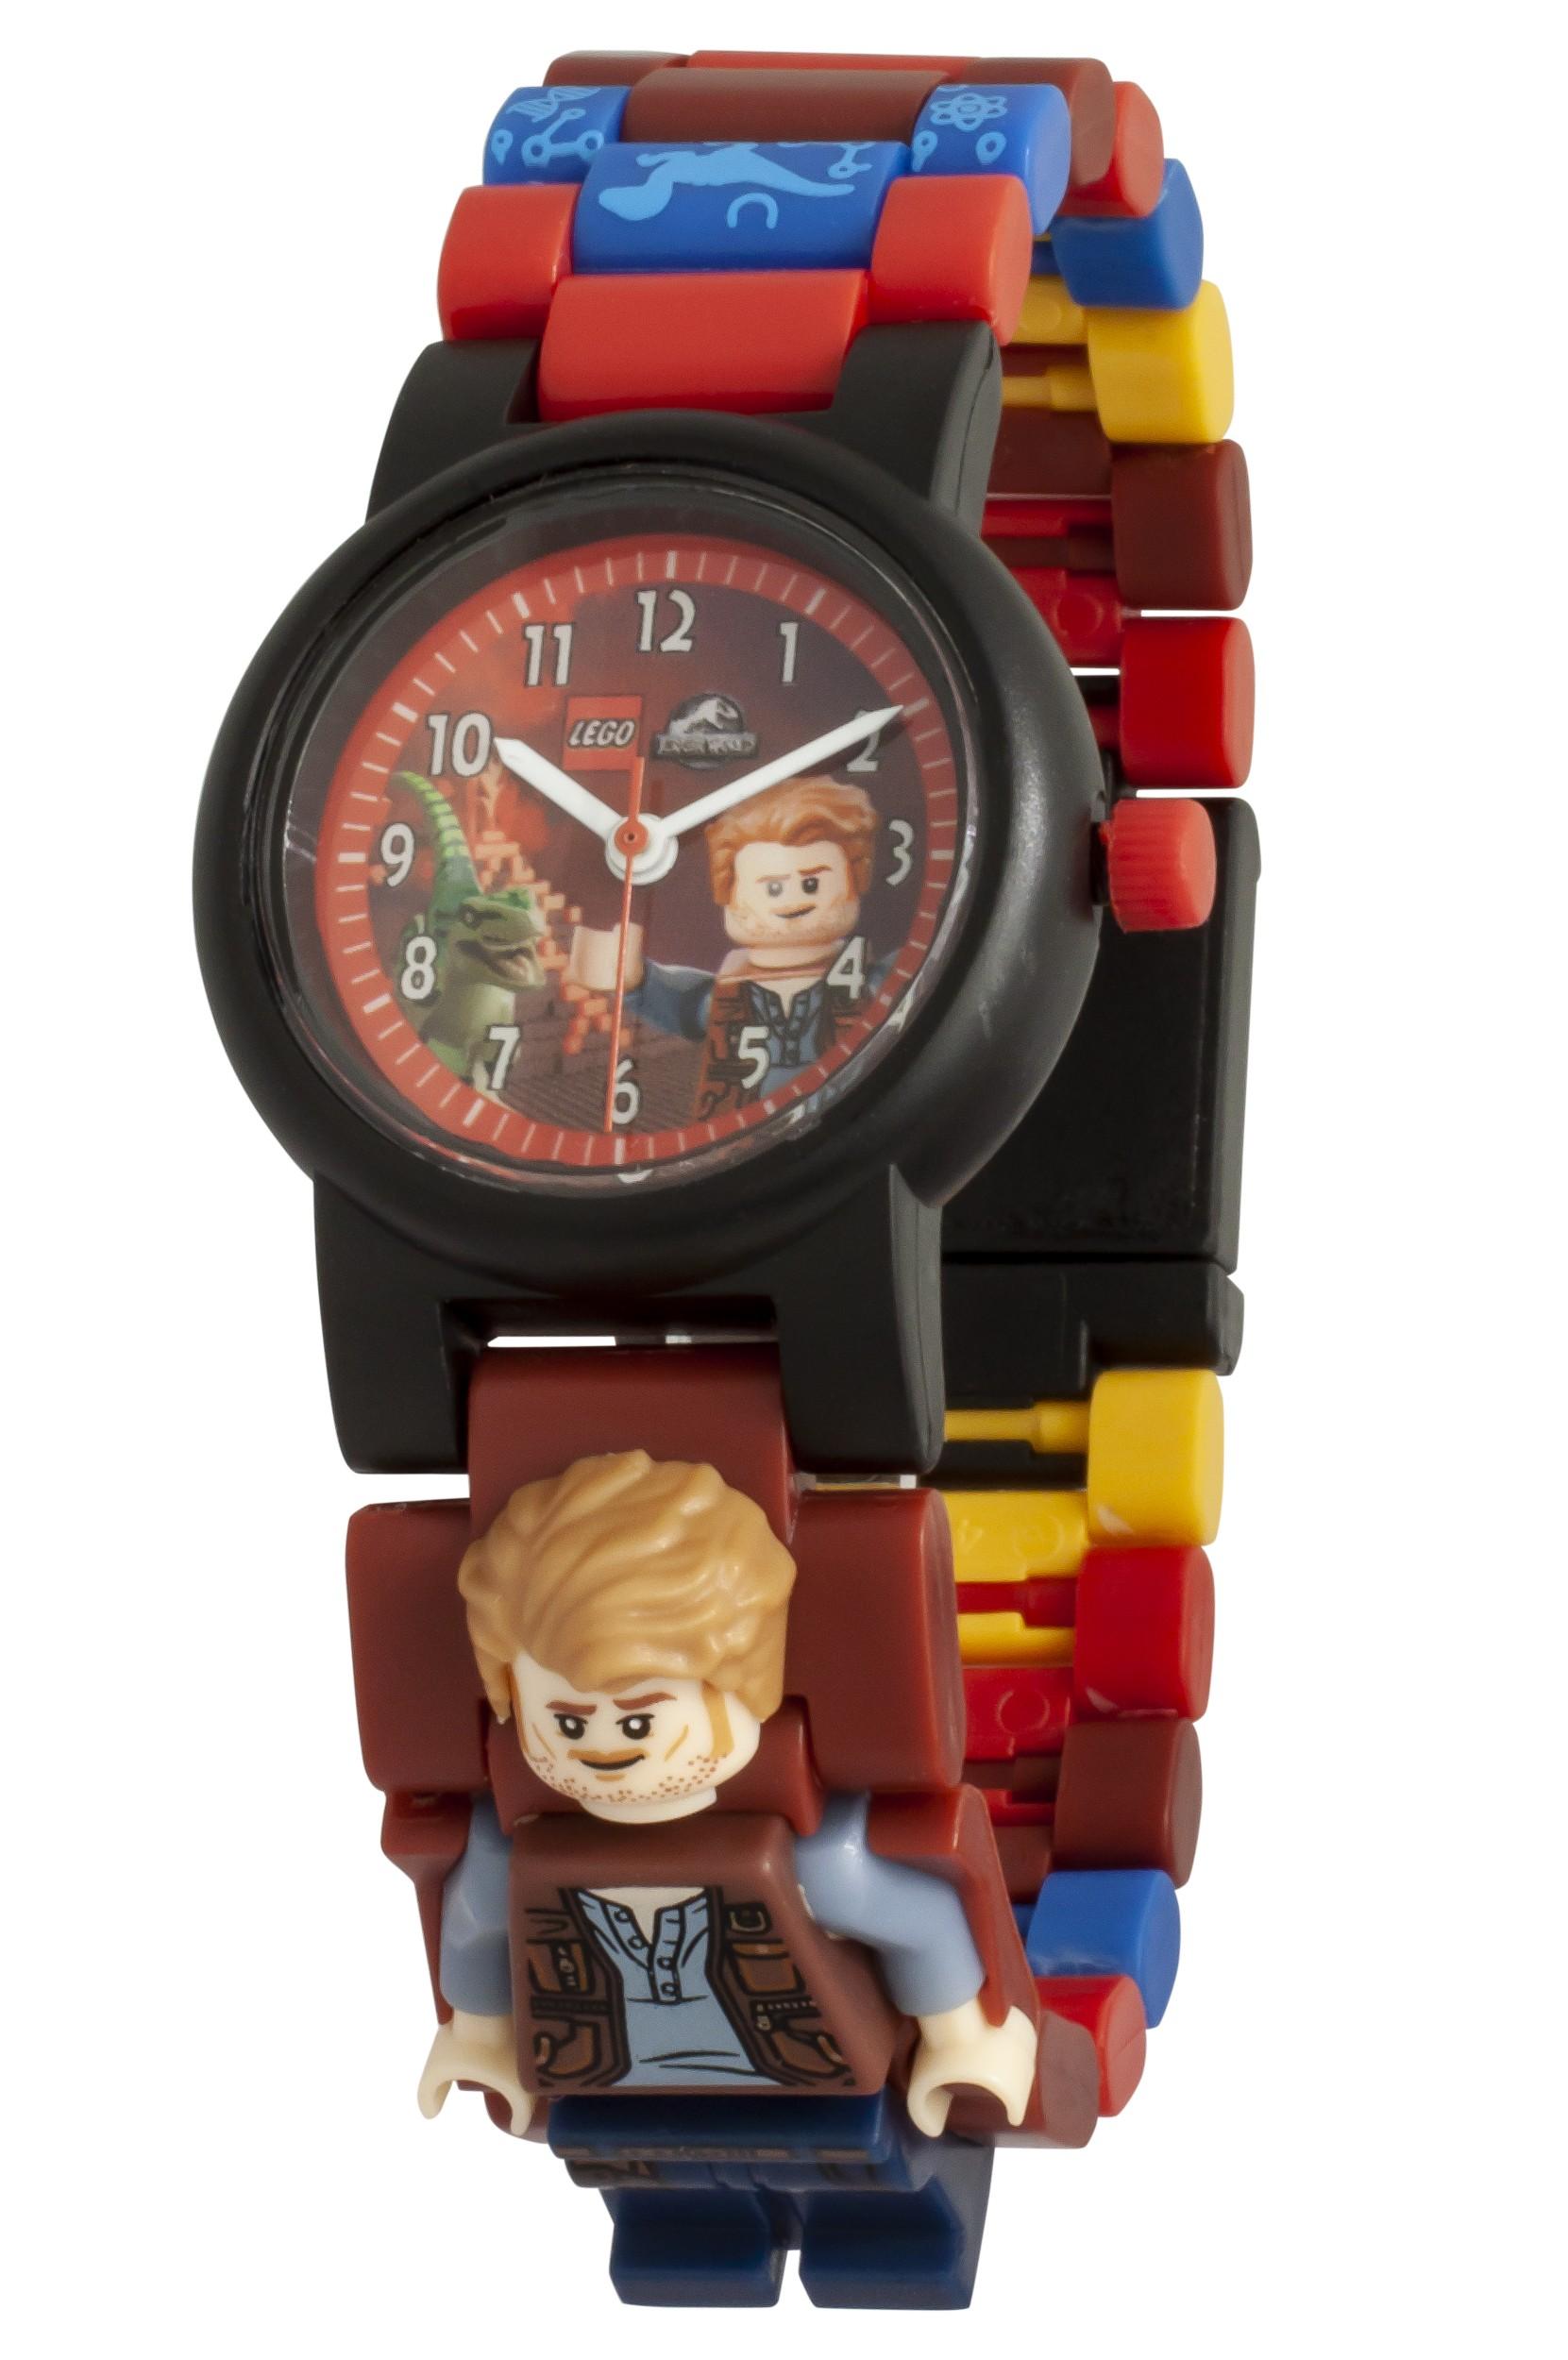 Buy LEGO - Kids Link Watch - Jurassic World - Owen (8021261)